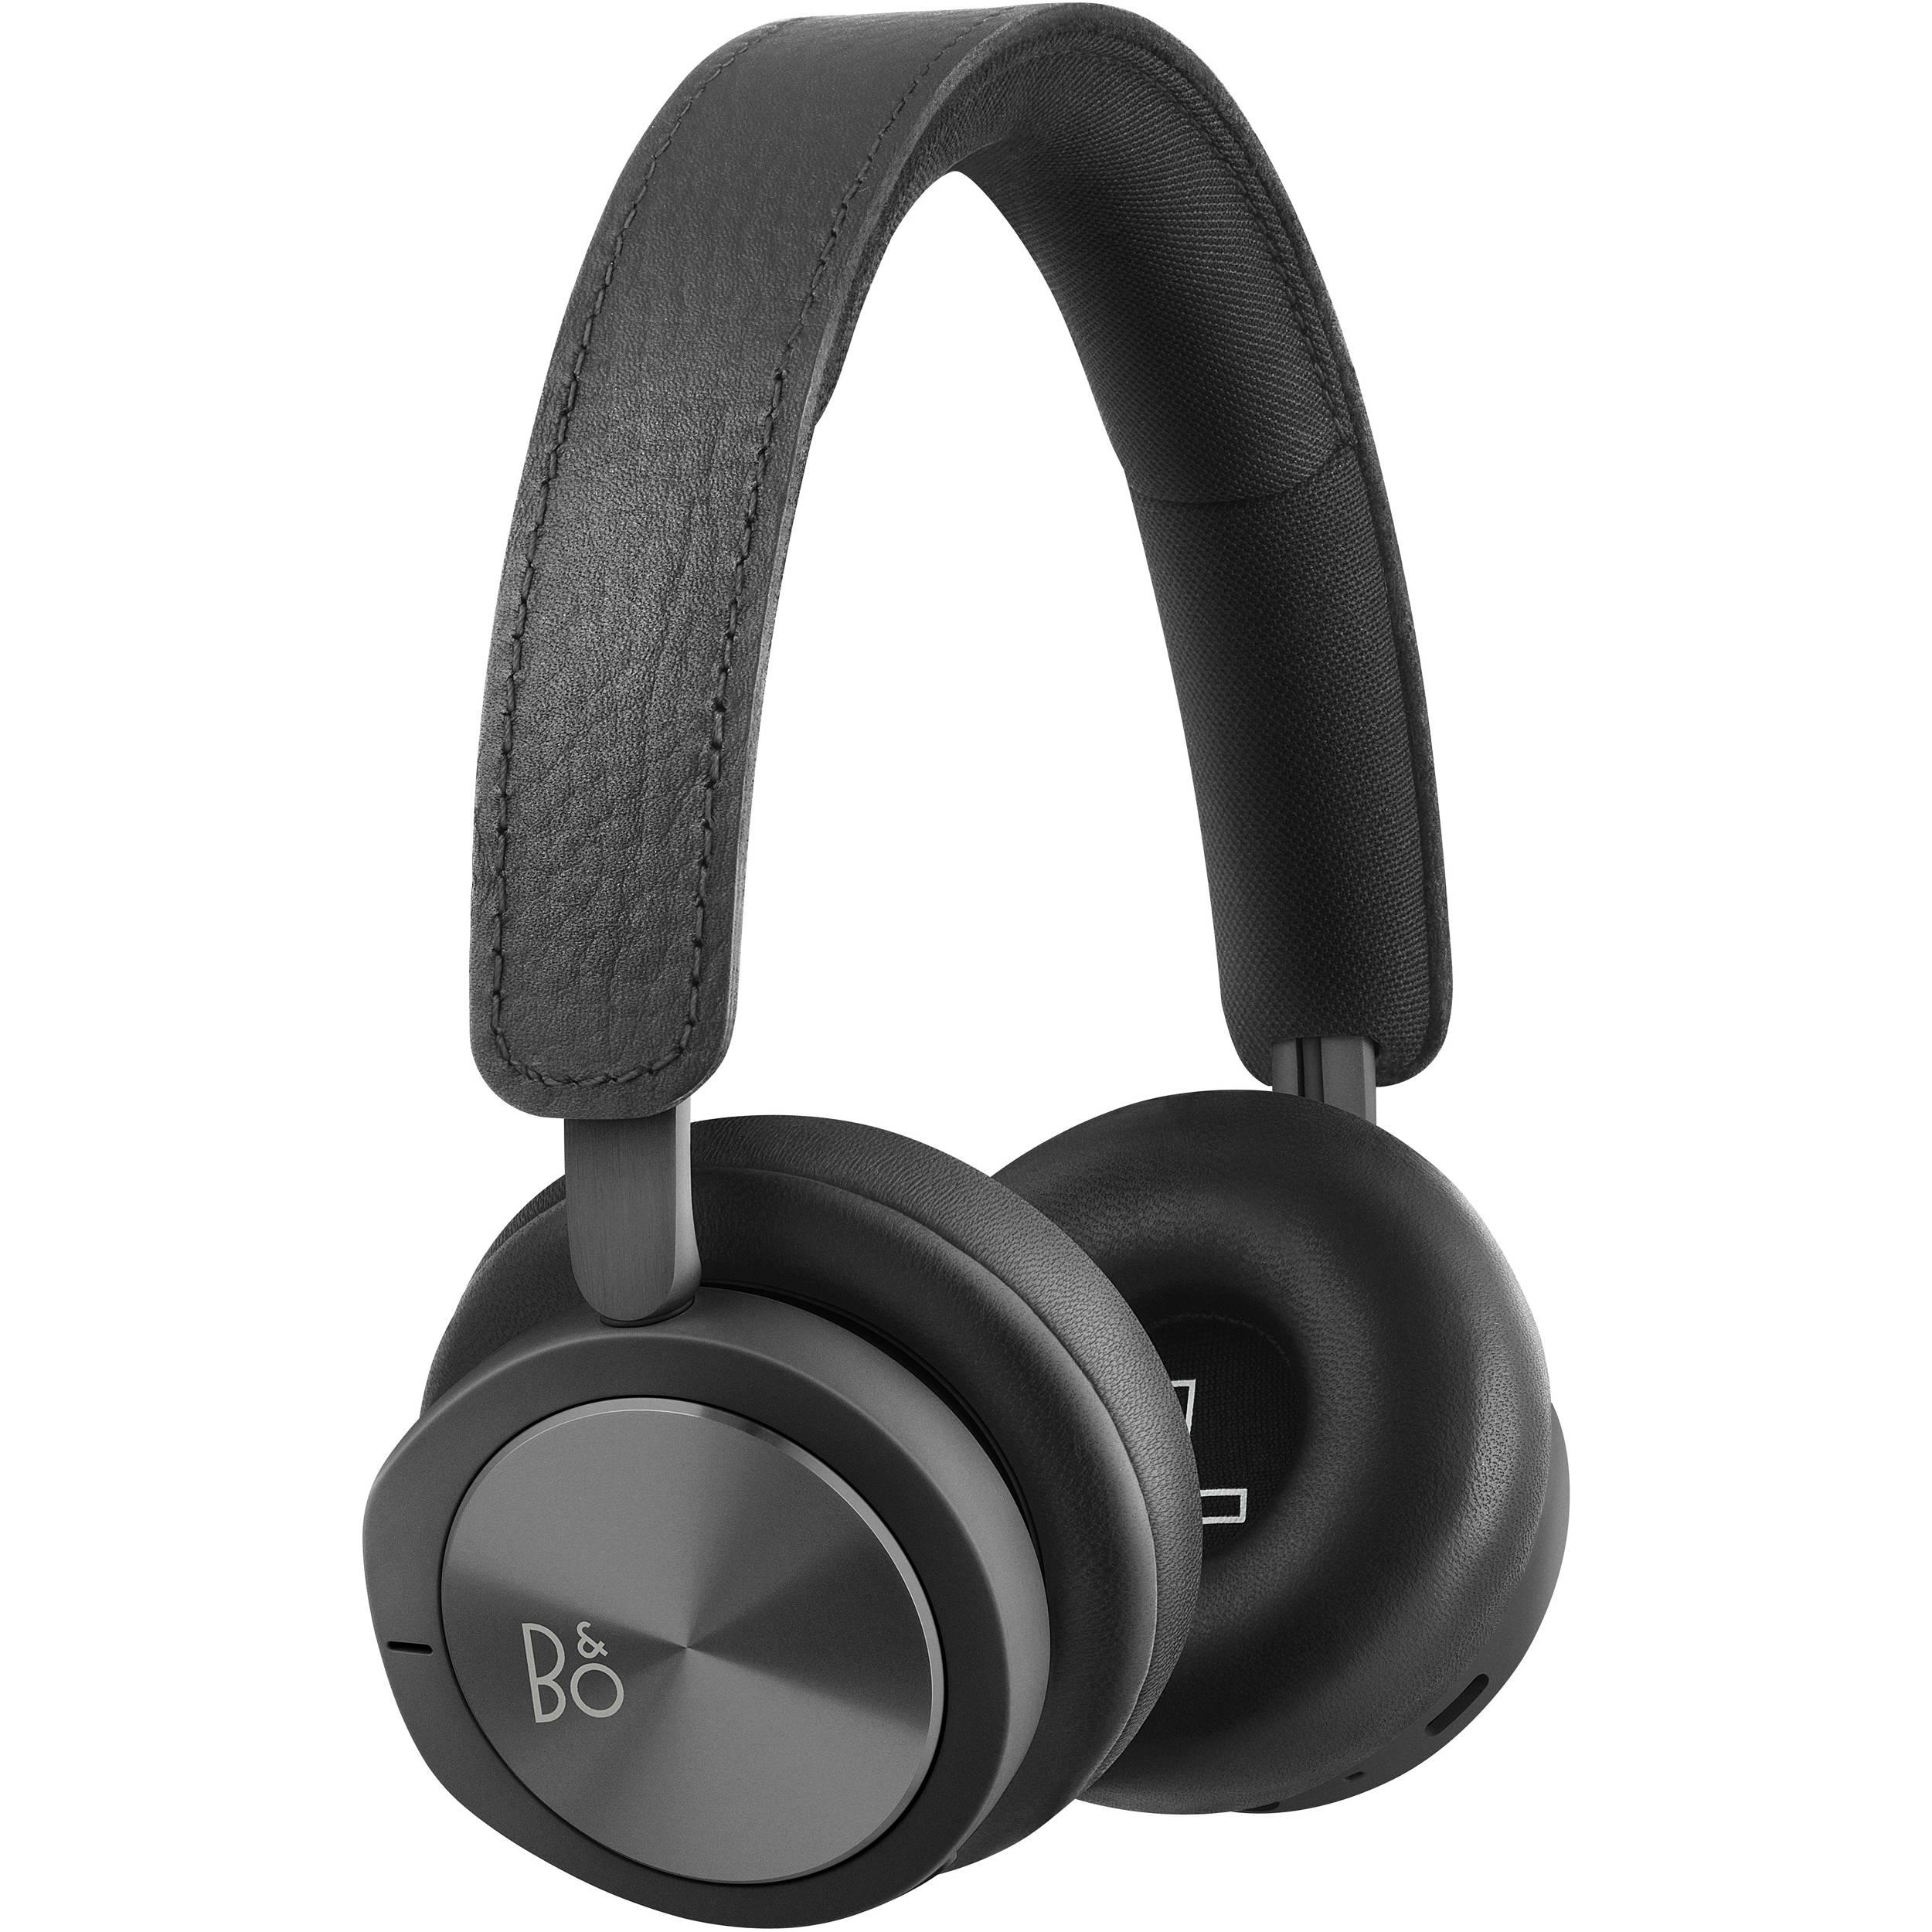 7c36e7cd868 Bang & Olufsen Beoplay H8i Bluetooth On-Ear Headphones 1645126